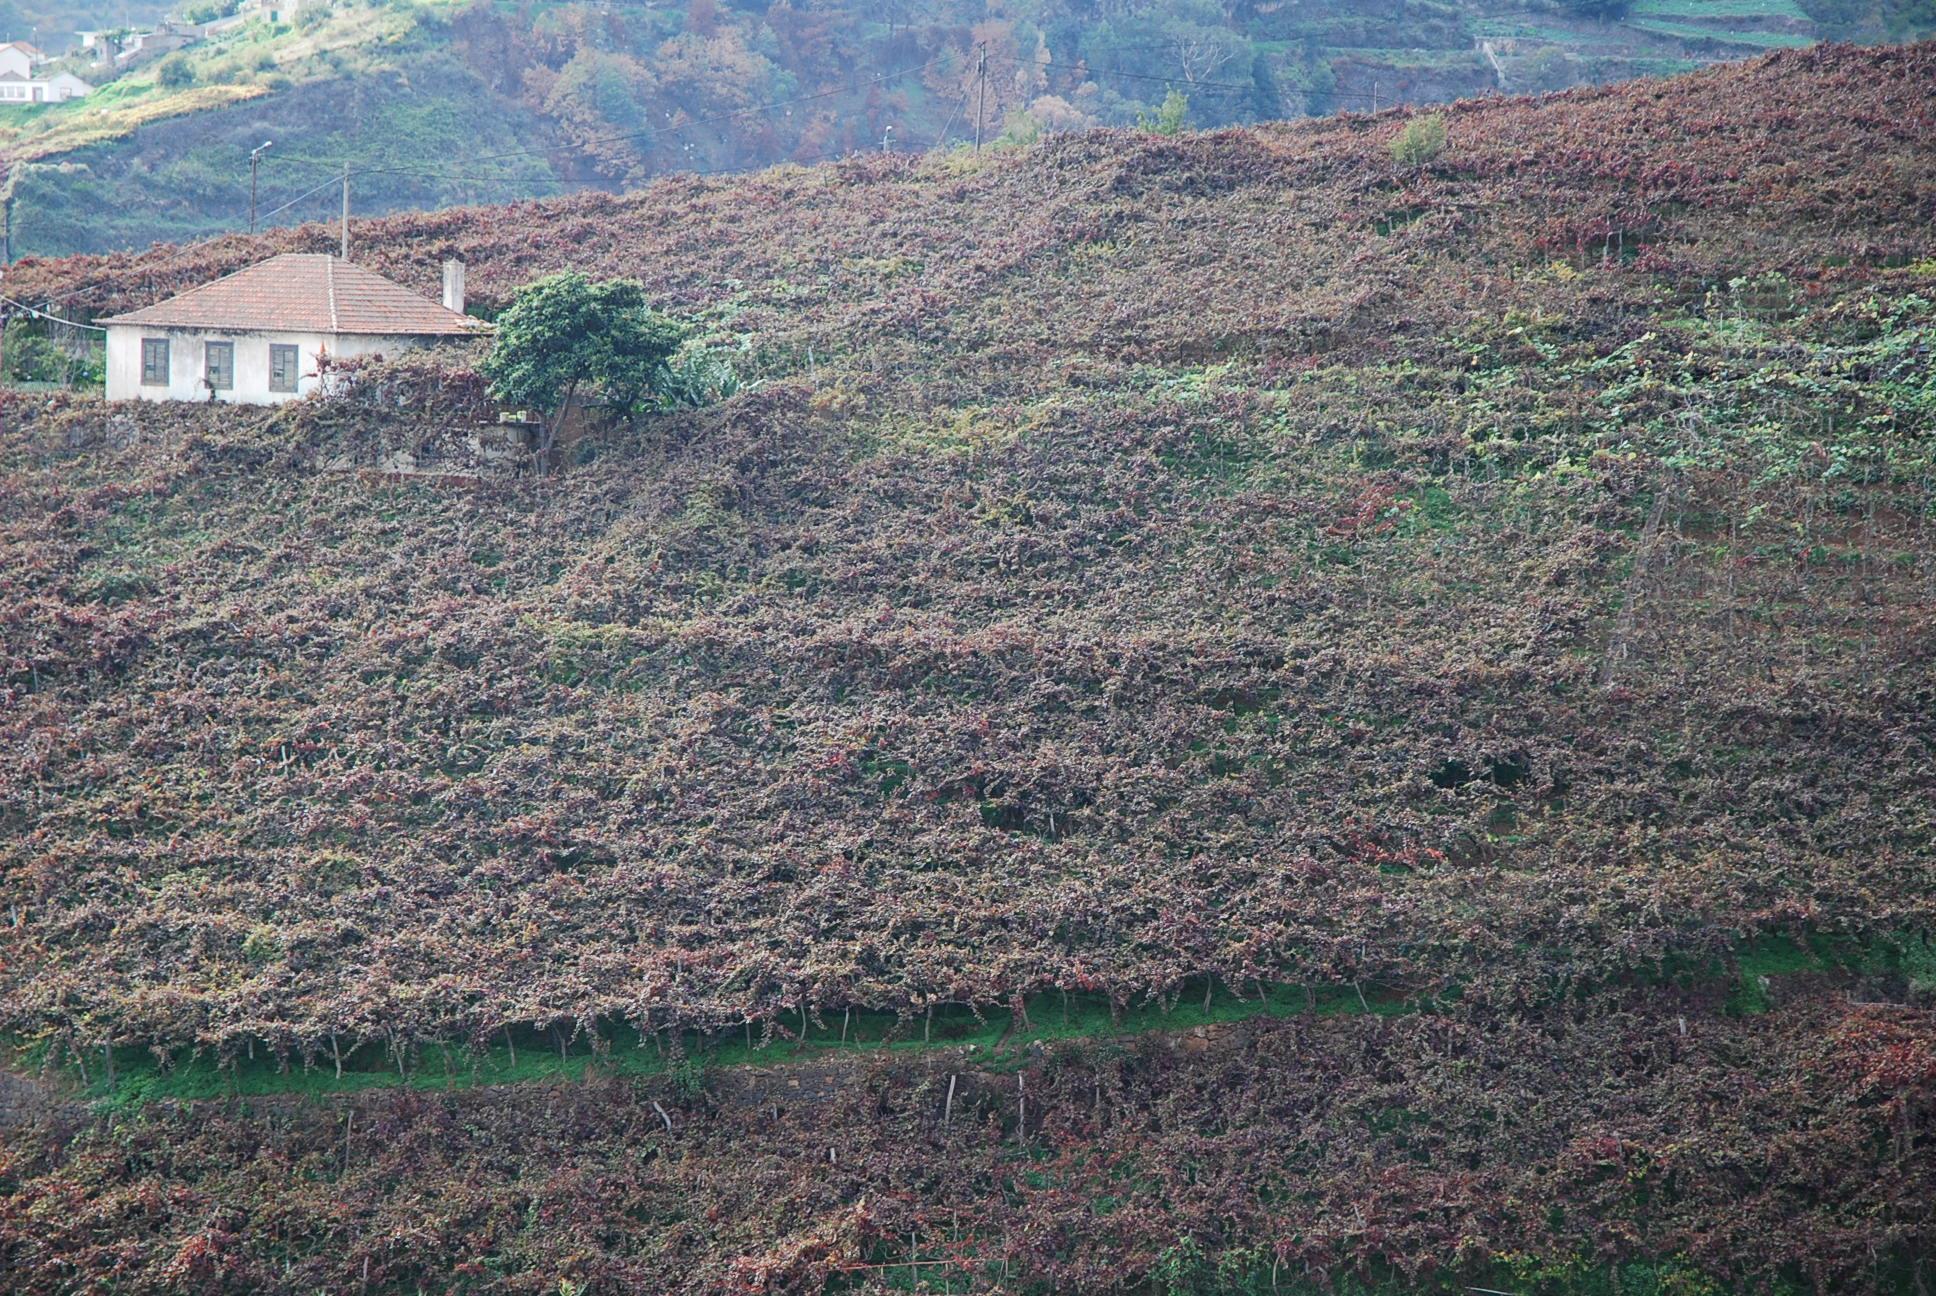 Latada-vineyards of Madeira (Broadbent)